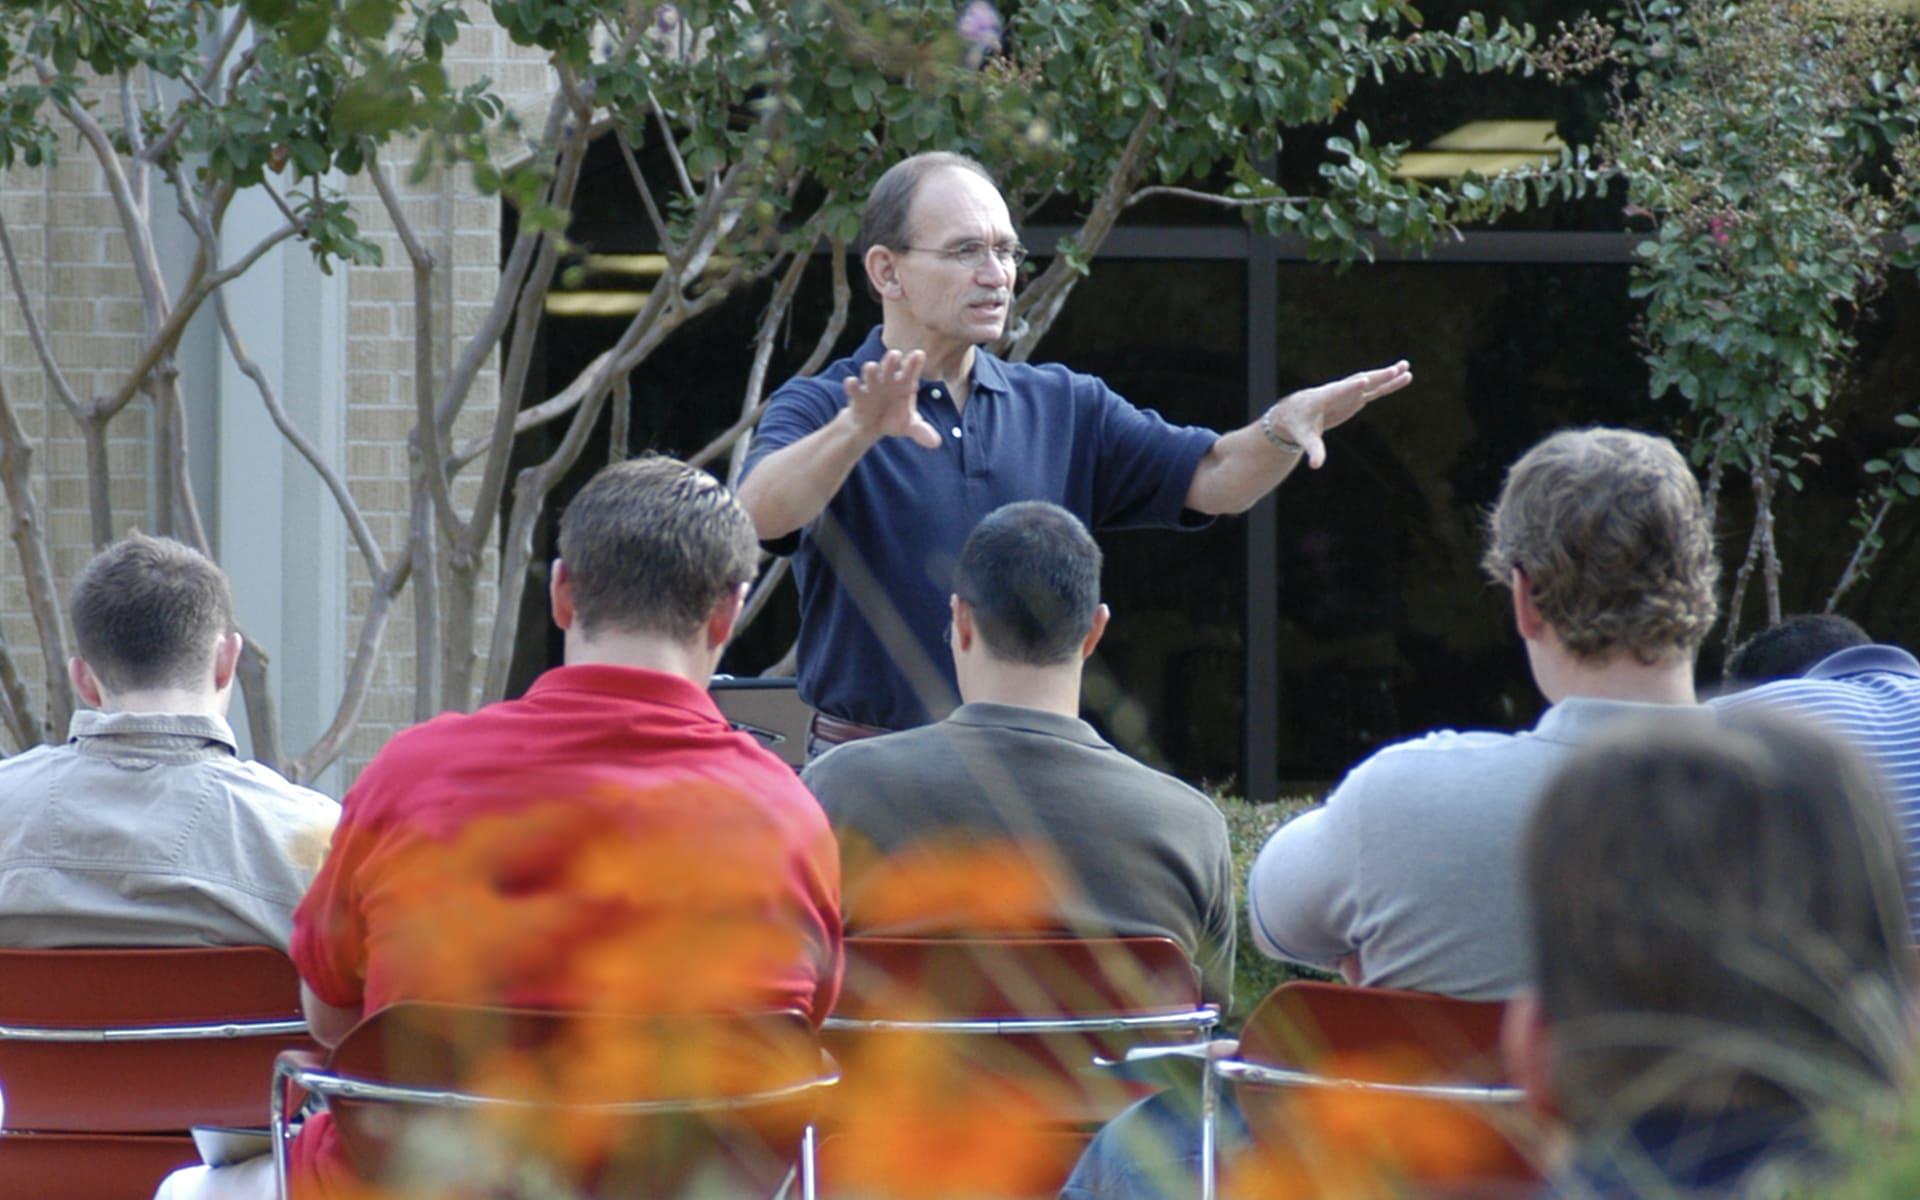 Dr Horell teaching a class outside